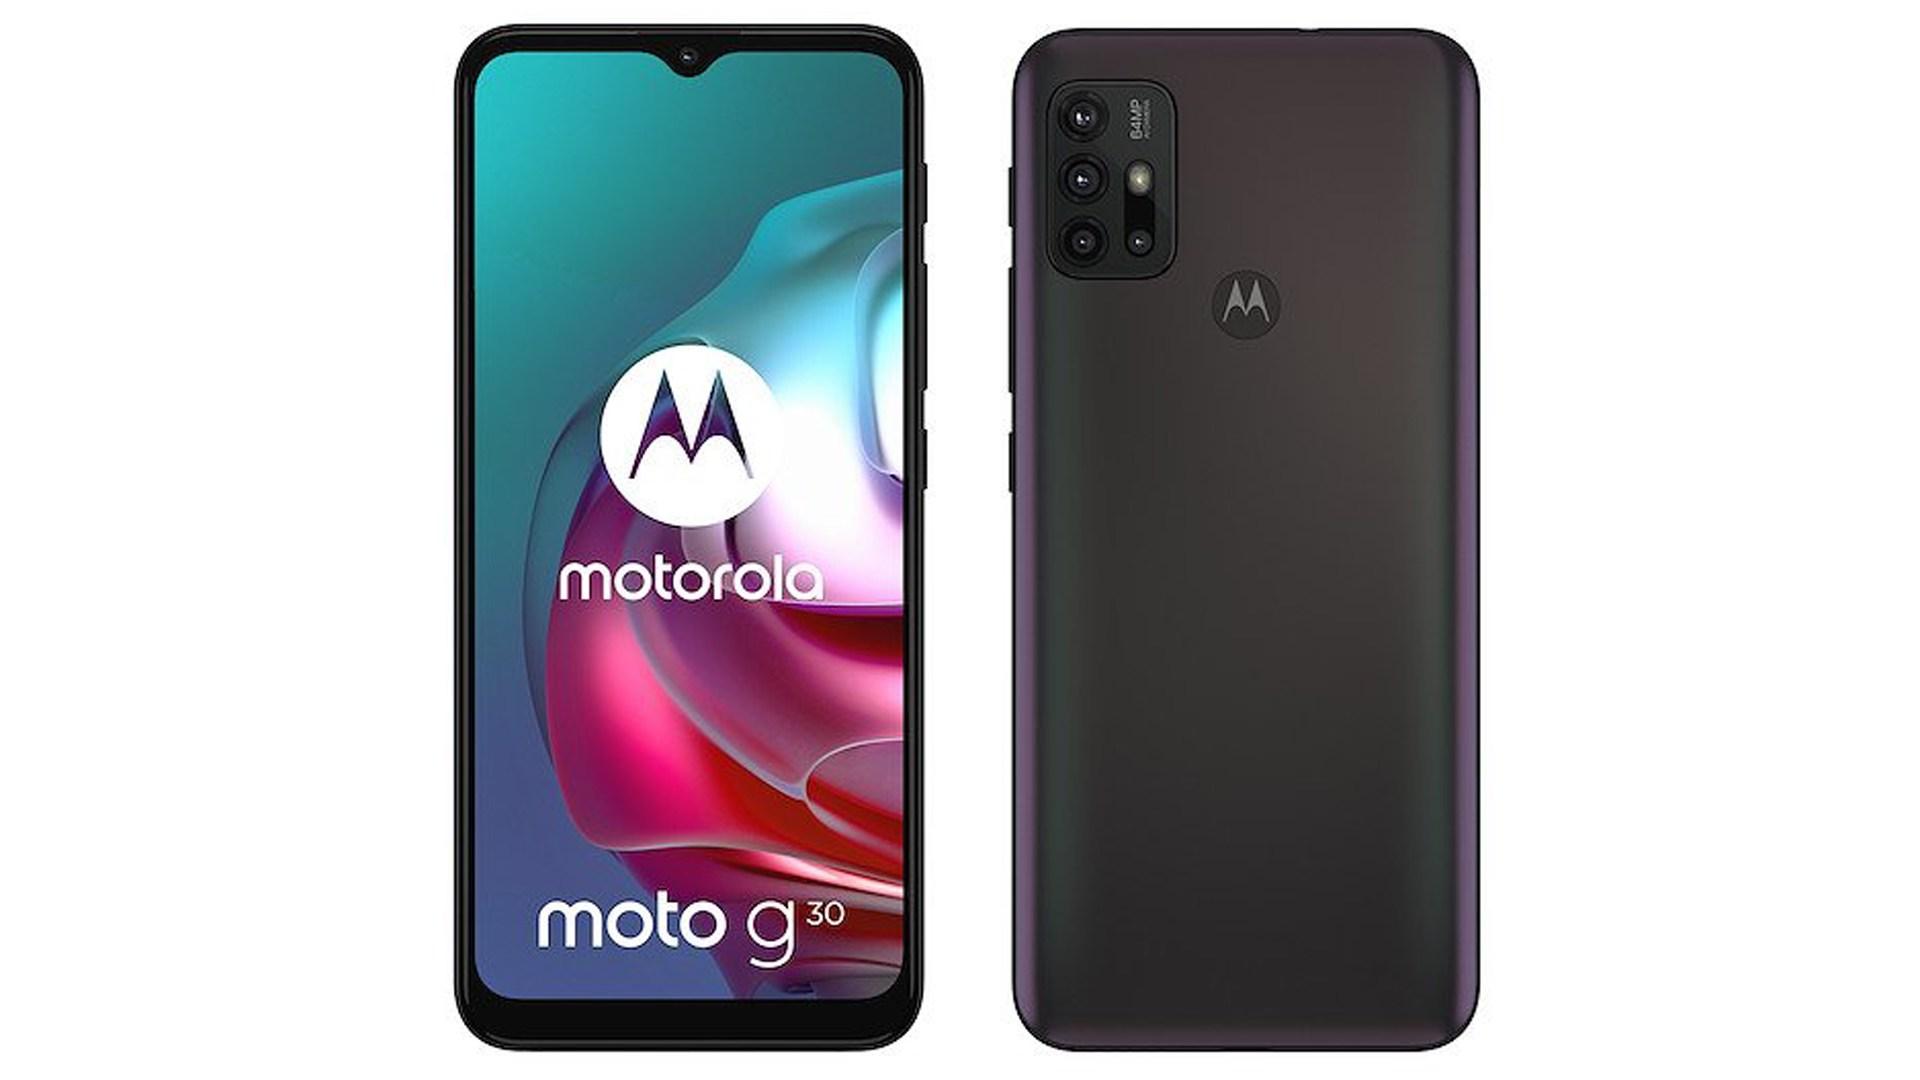 Smartphone, Prozessor, Cpu, Chip, Octacore, Qualcomm, Motorola, Snapdragon, 4g, Moto, Qualcomm Snapdragon 662, Moto E7, Moto G30, Moto E7 Power